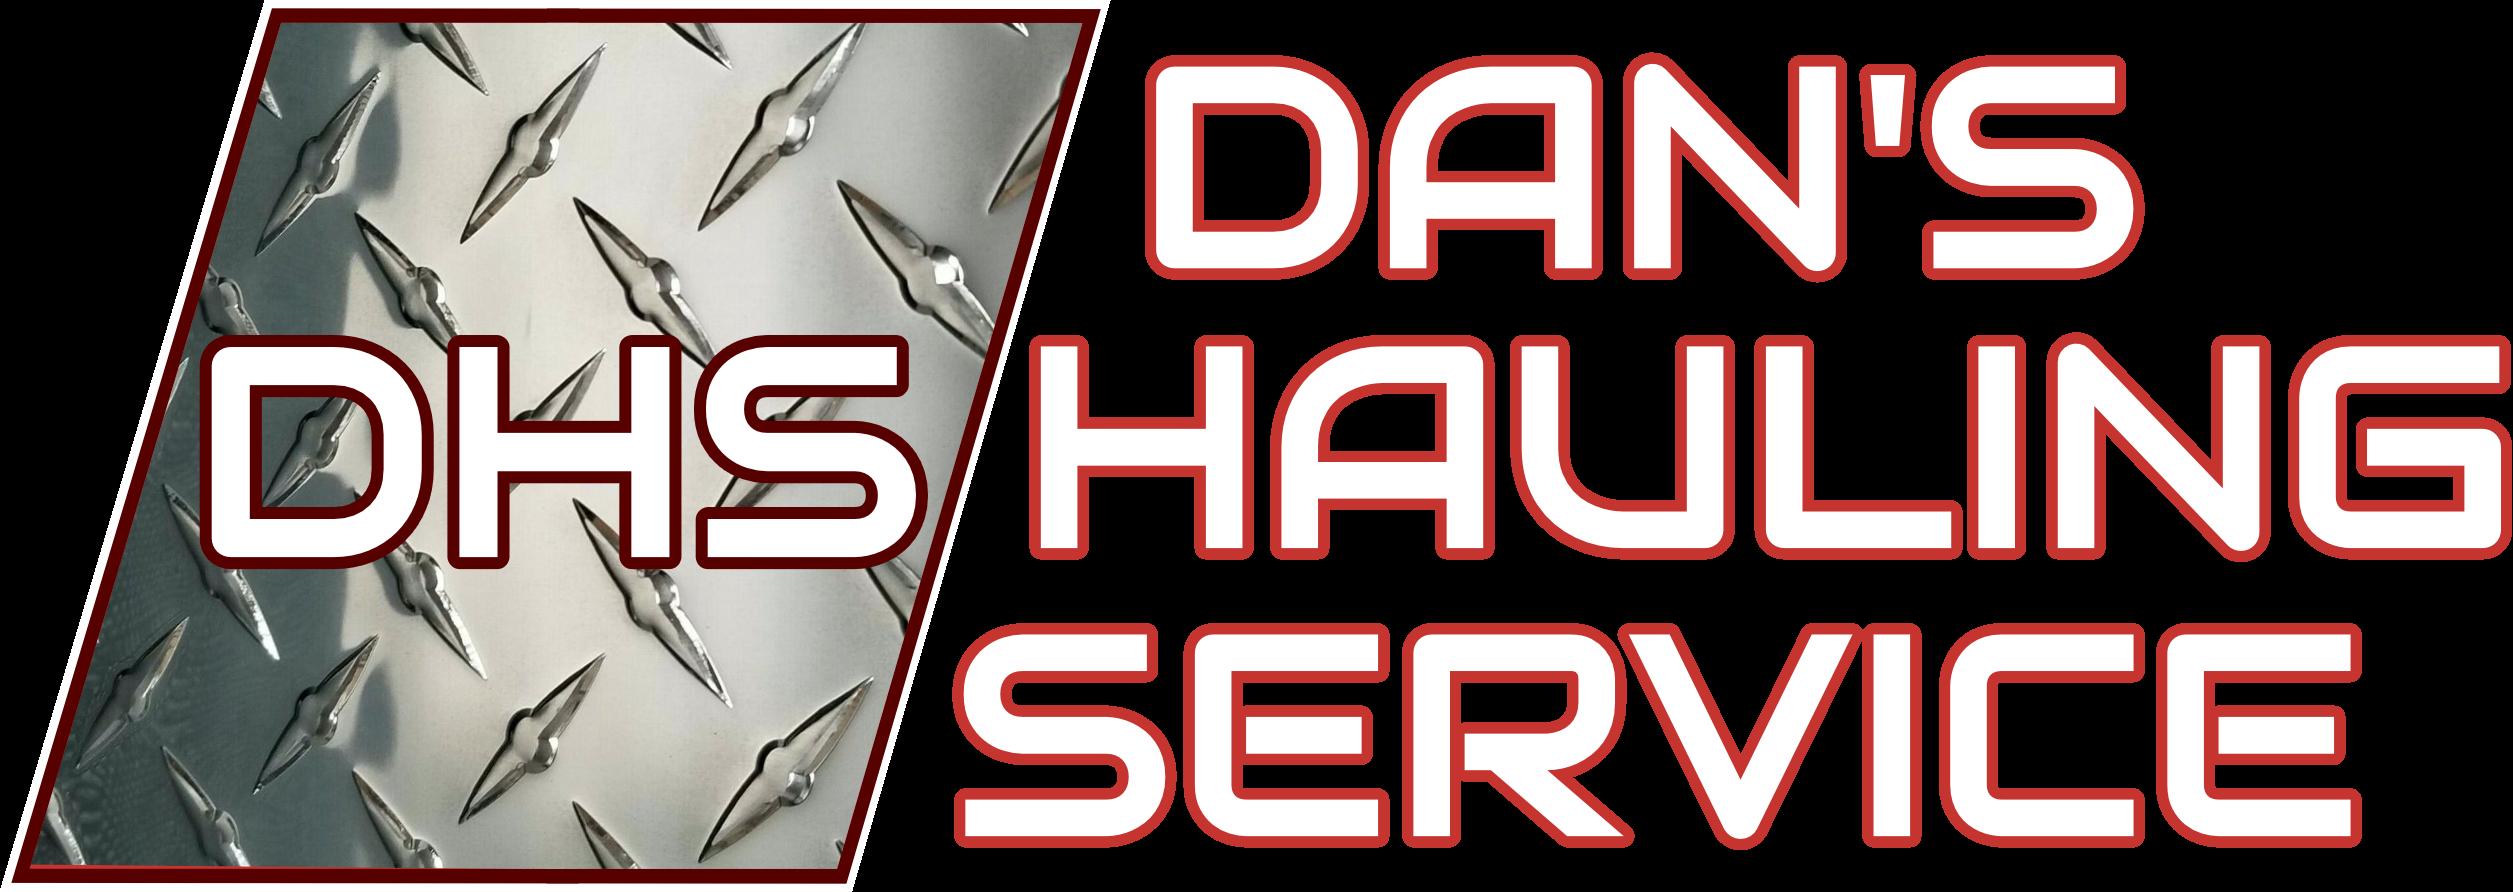 Dan's Hauling Service